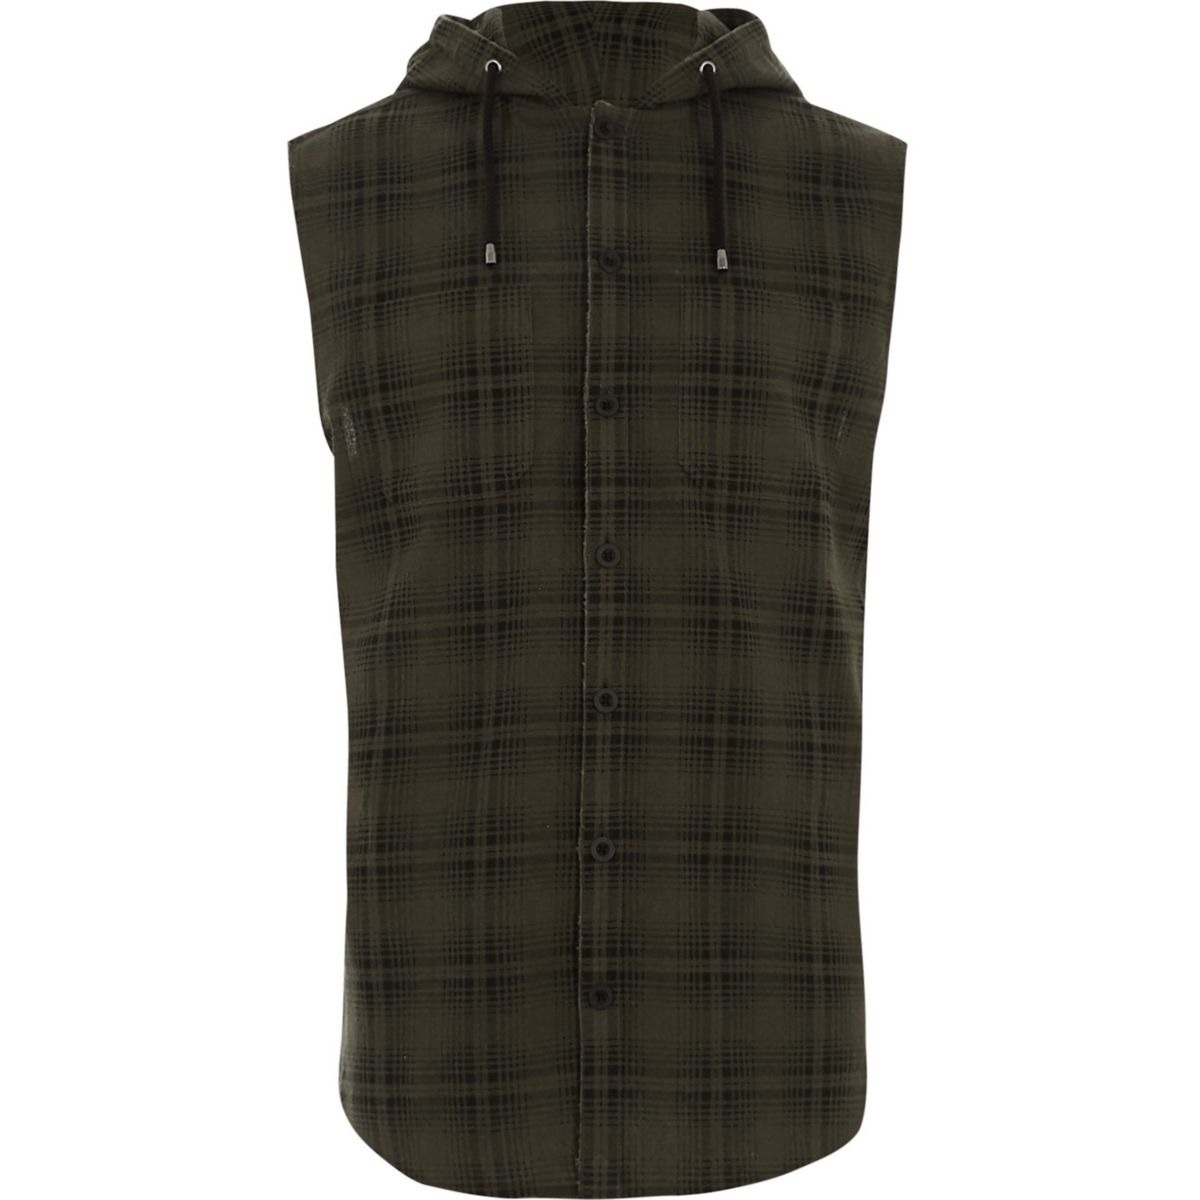 Green check hooded sleeveless shirt